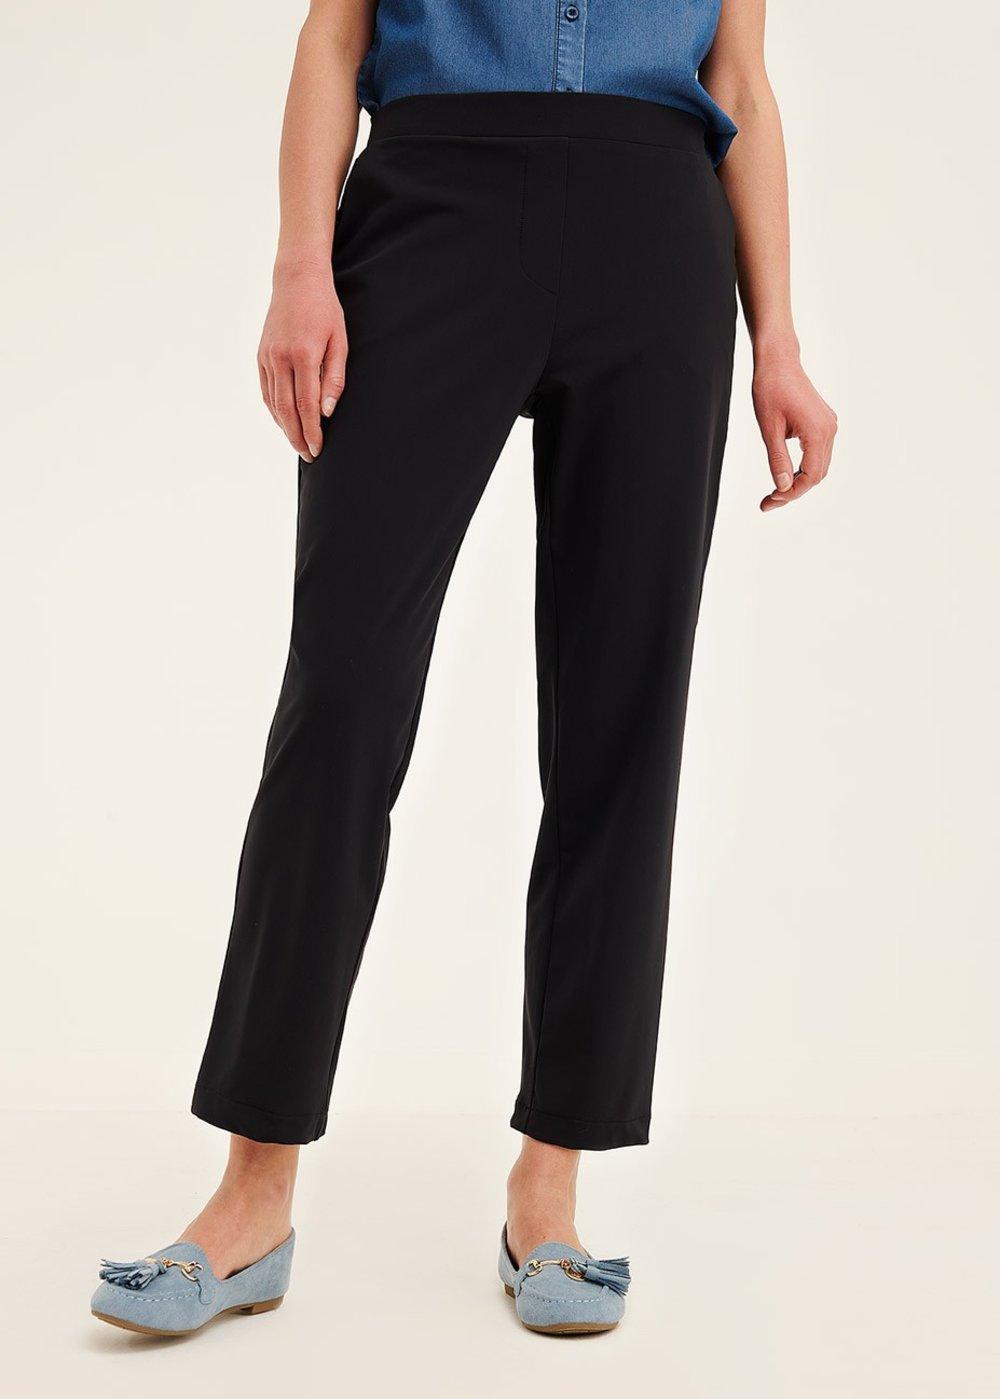 Cara elastic trousers in technical fabric - Black - Woman